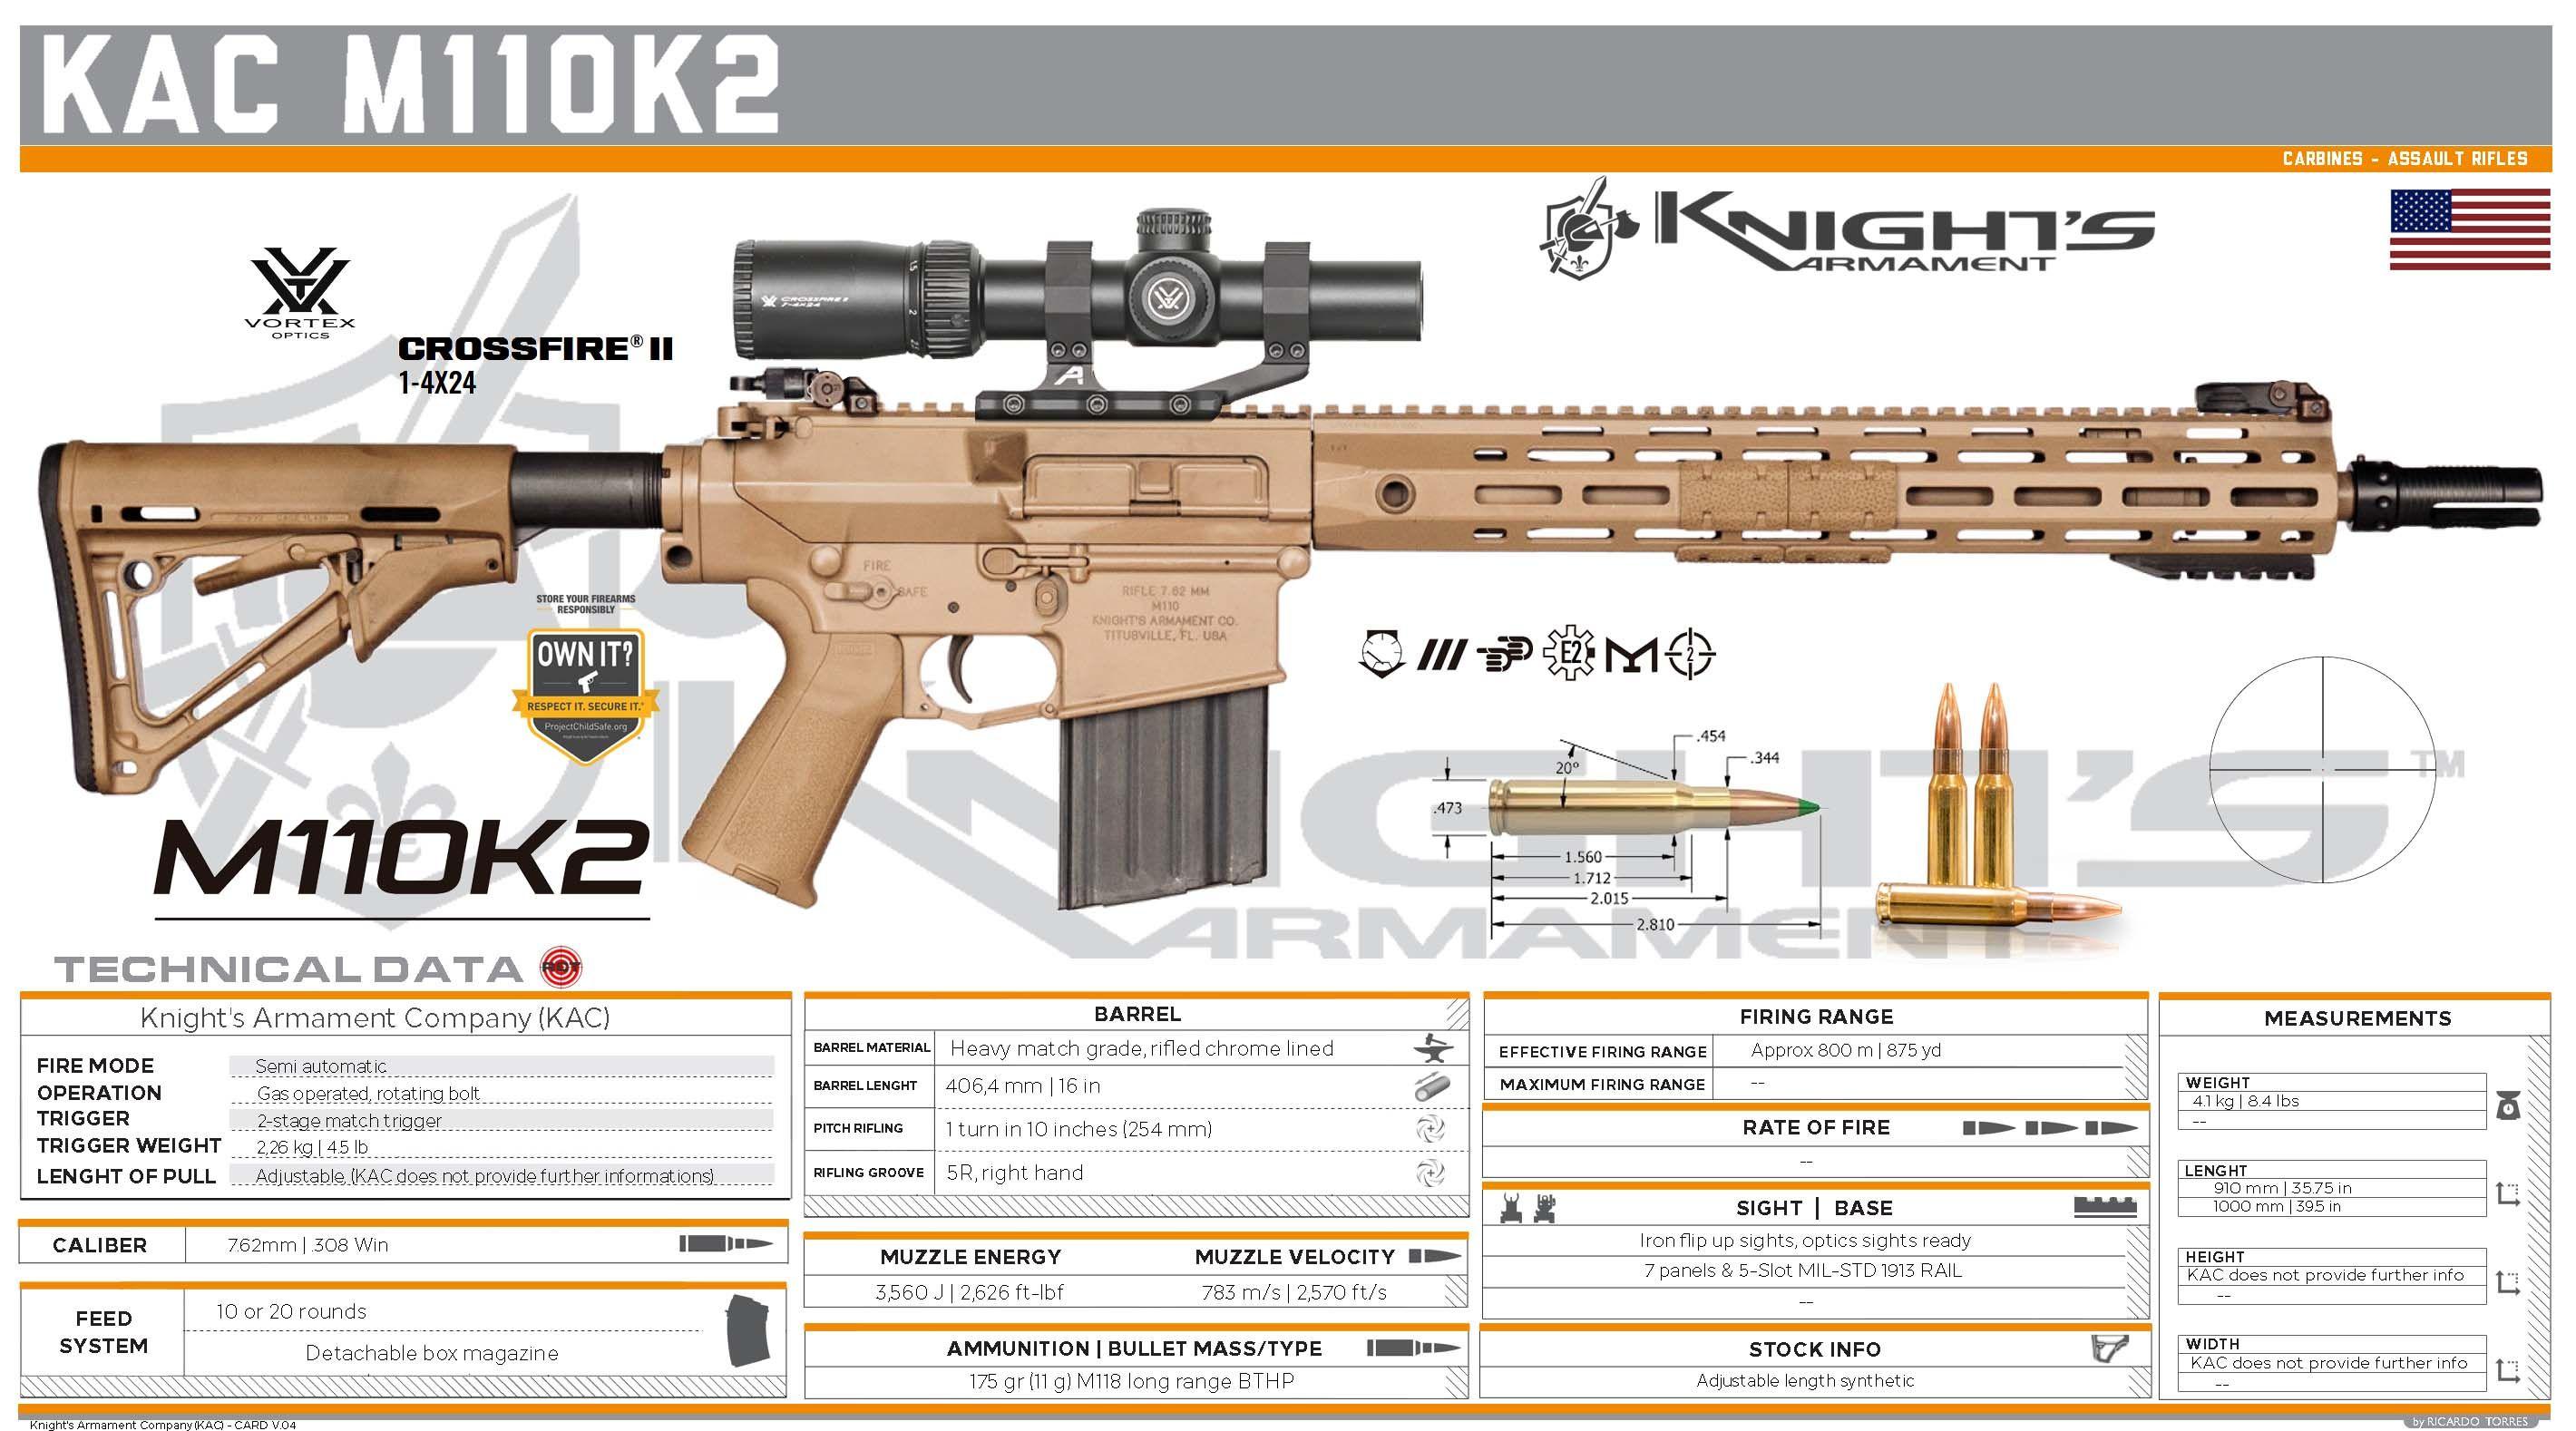 KAC M110K2 MLOK in 2020 Guns, Knights armament